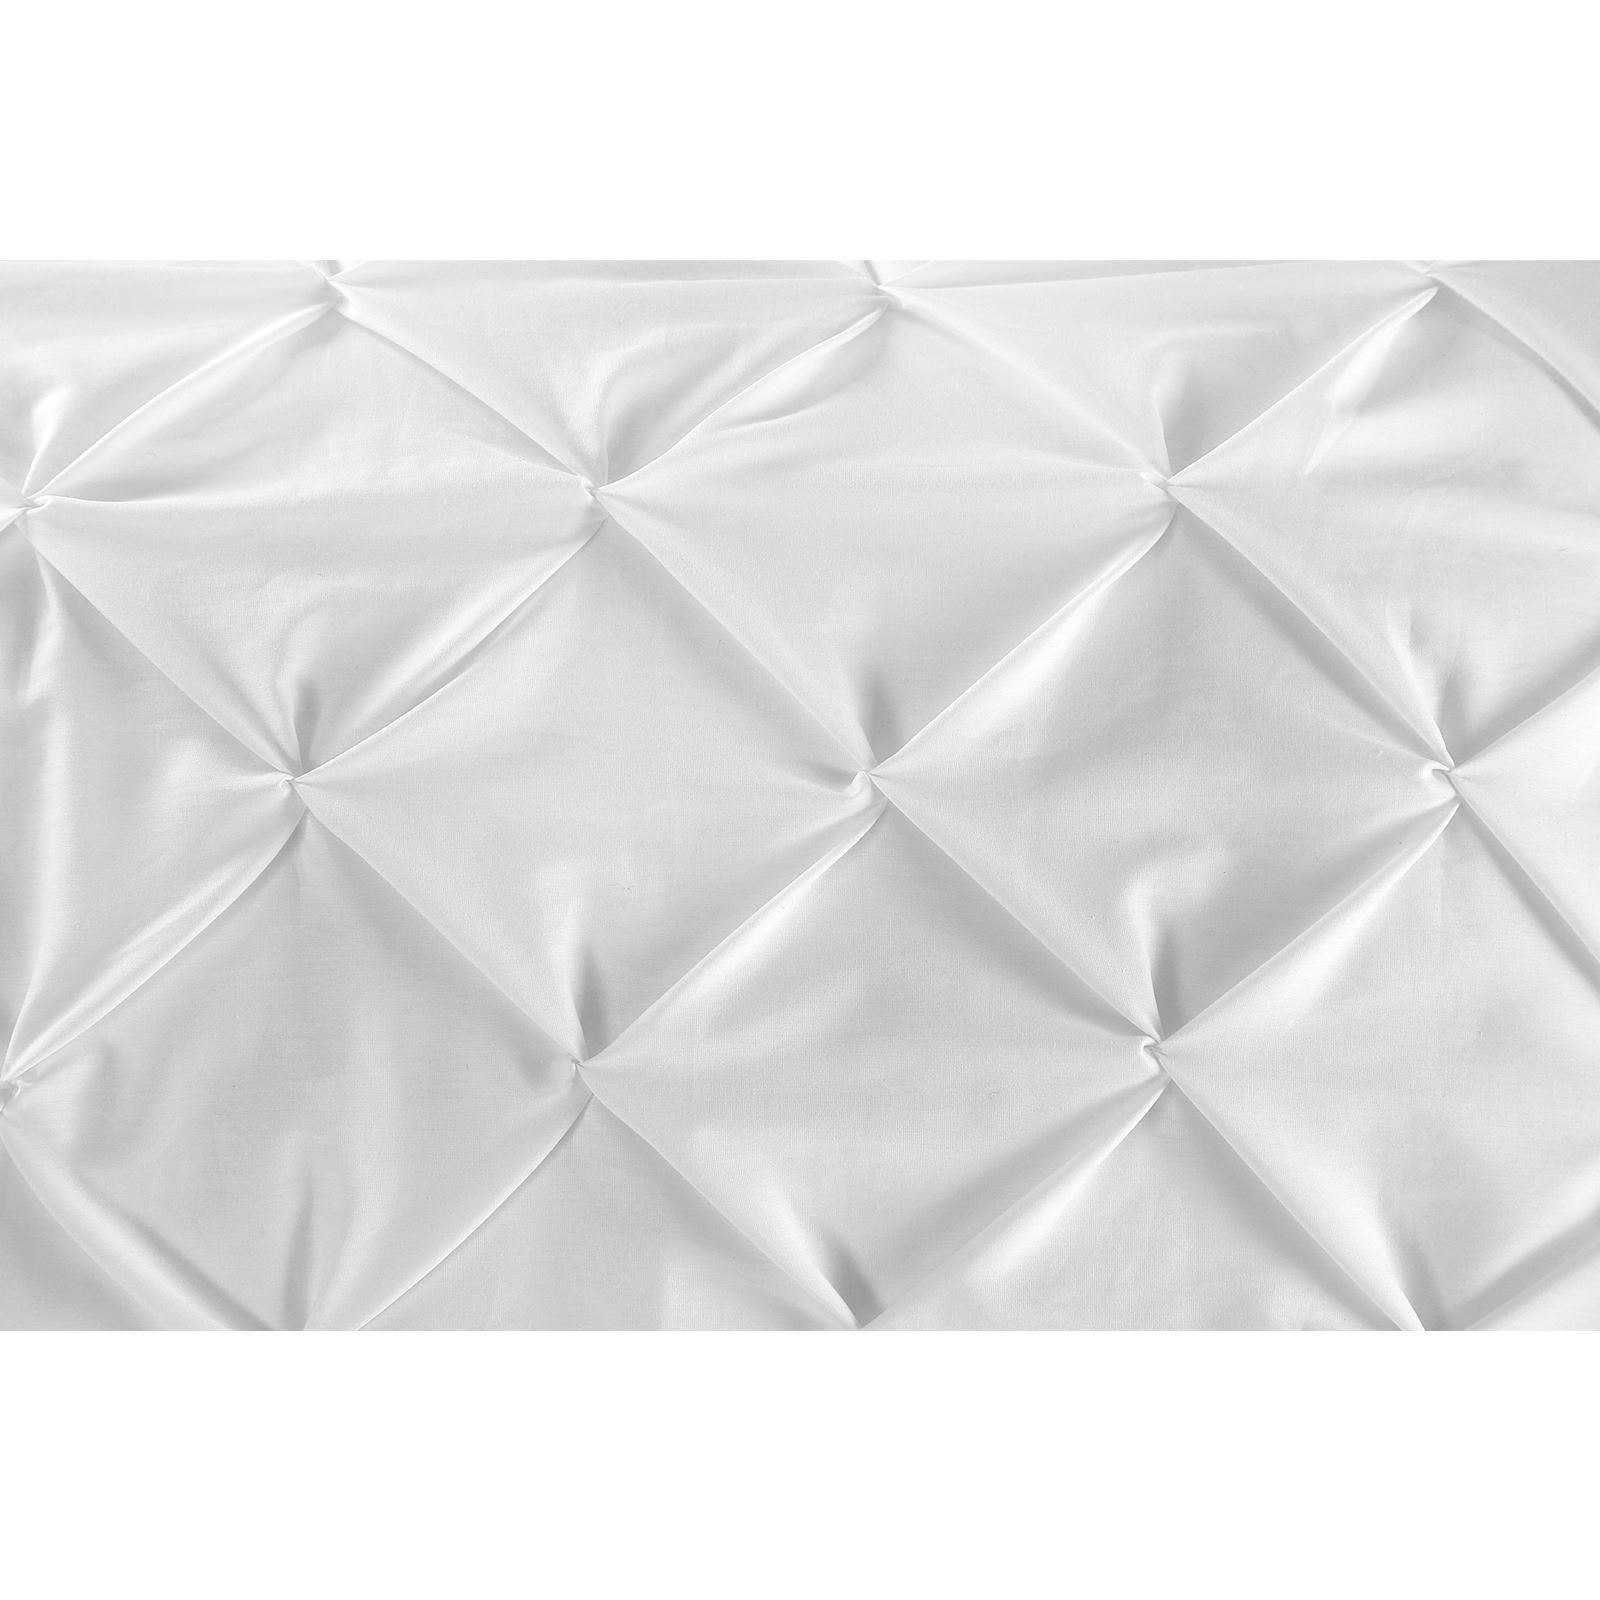 Luxury-Pure-100-Cotton-200-Thread-Pinch-Pleat-Pintuck-Puckering-Duvet-Cover-Set thumbnail 66